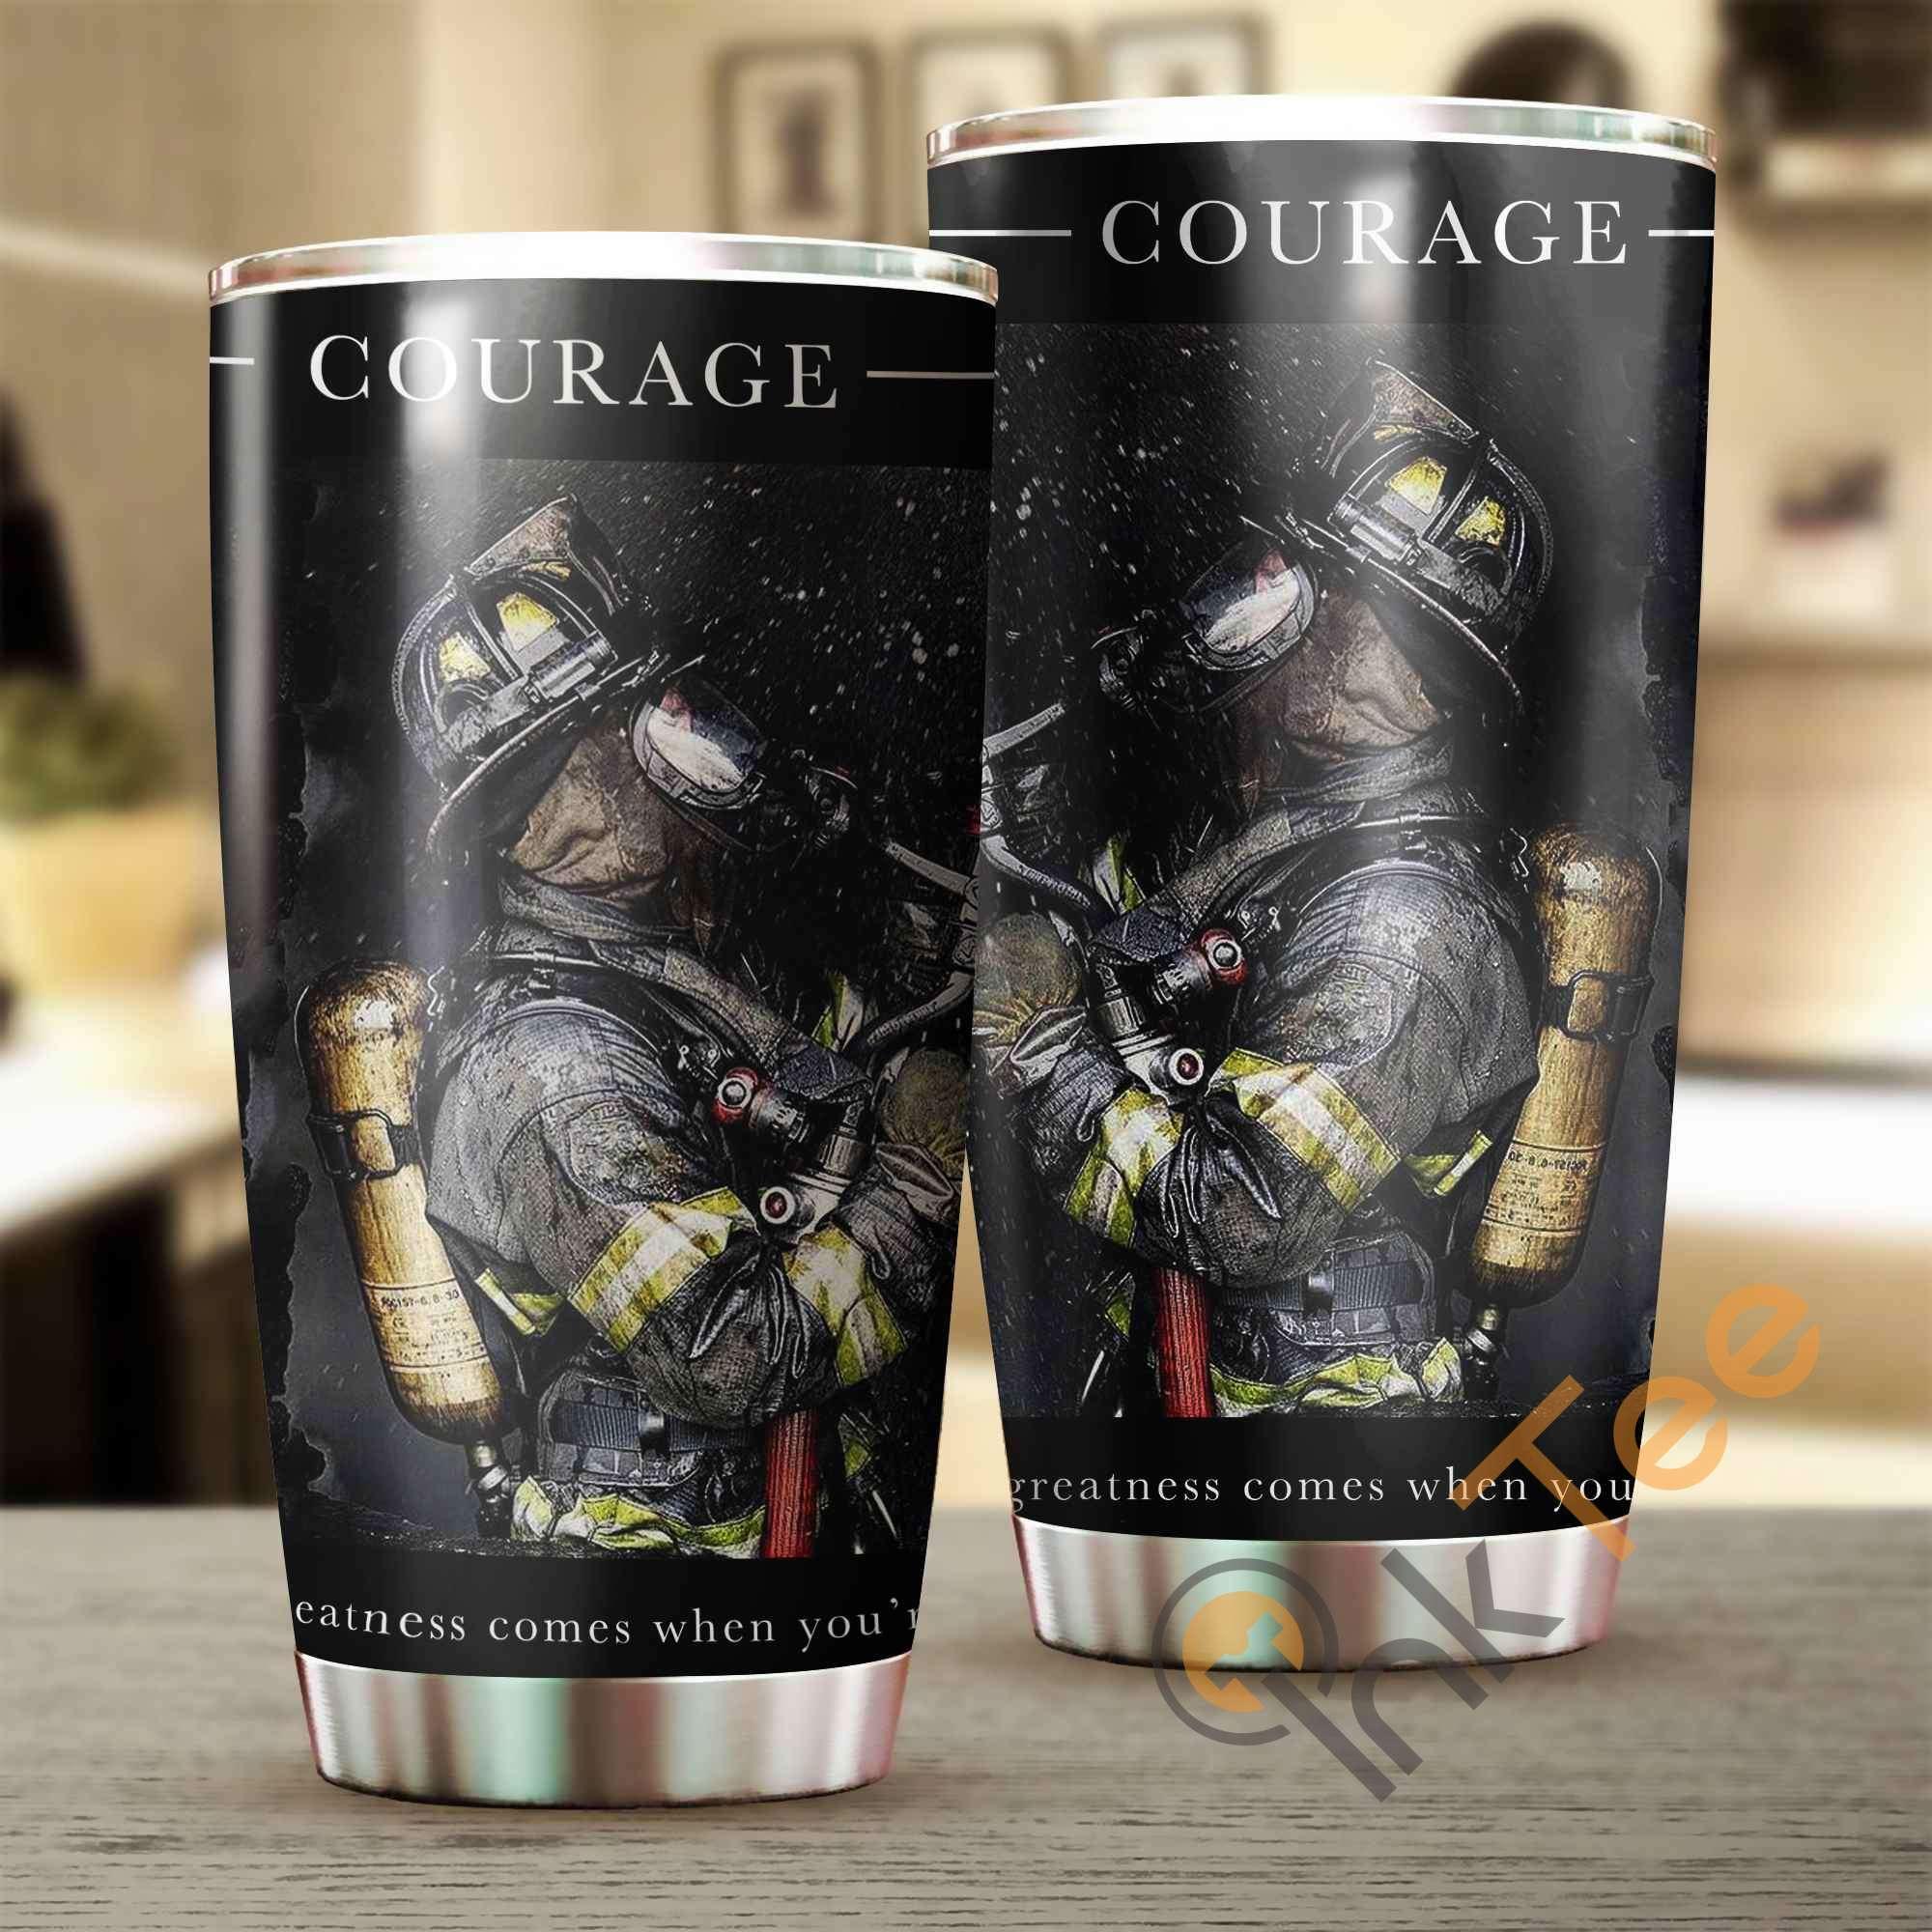 Firefighter's Courage Amazon Best Seller Sku 3071 Stainless Steel Tumbler